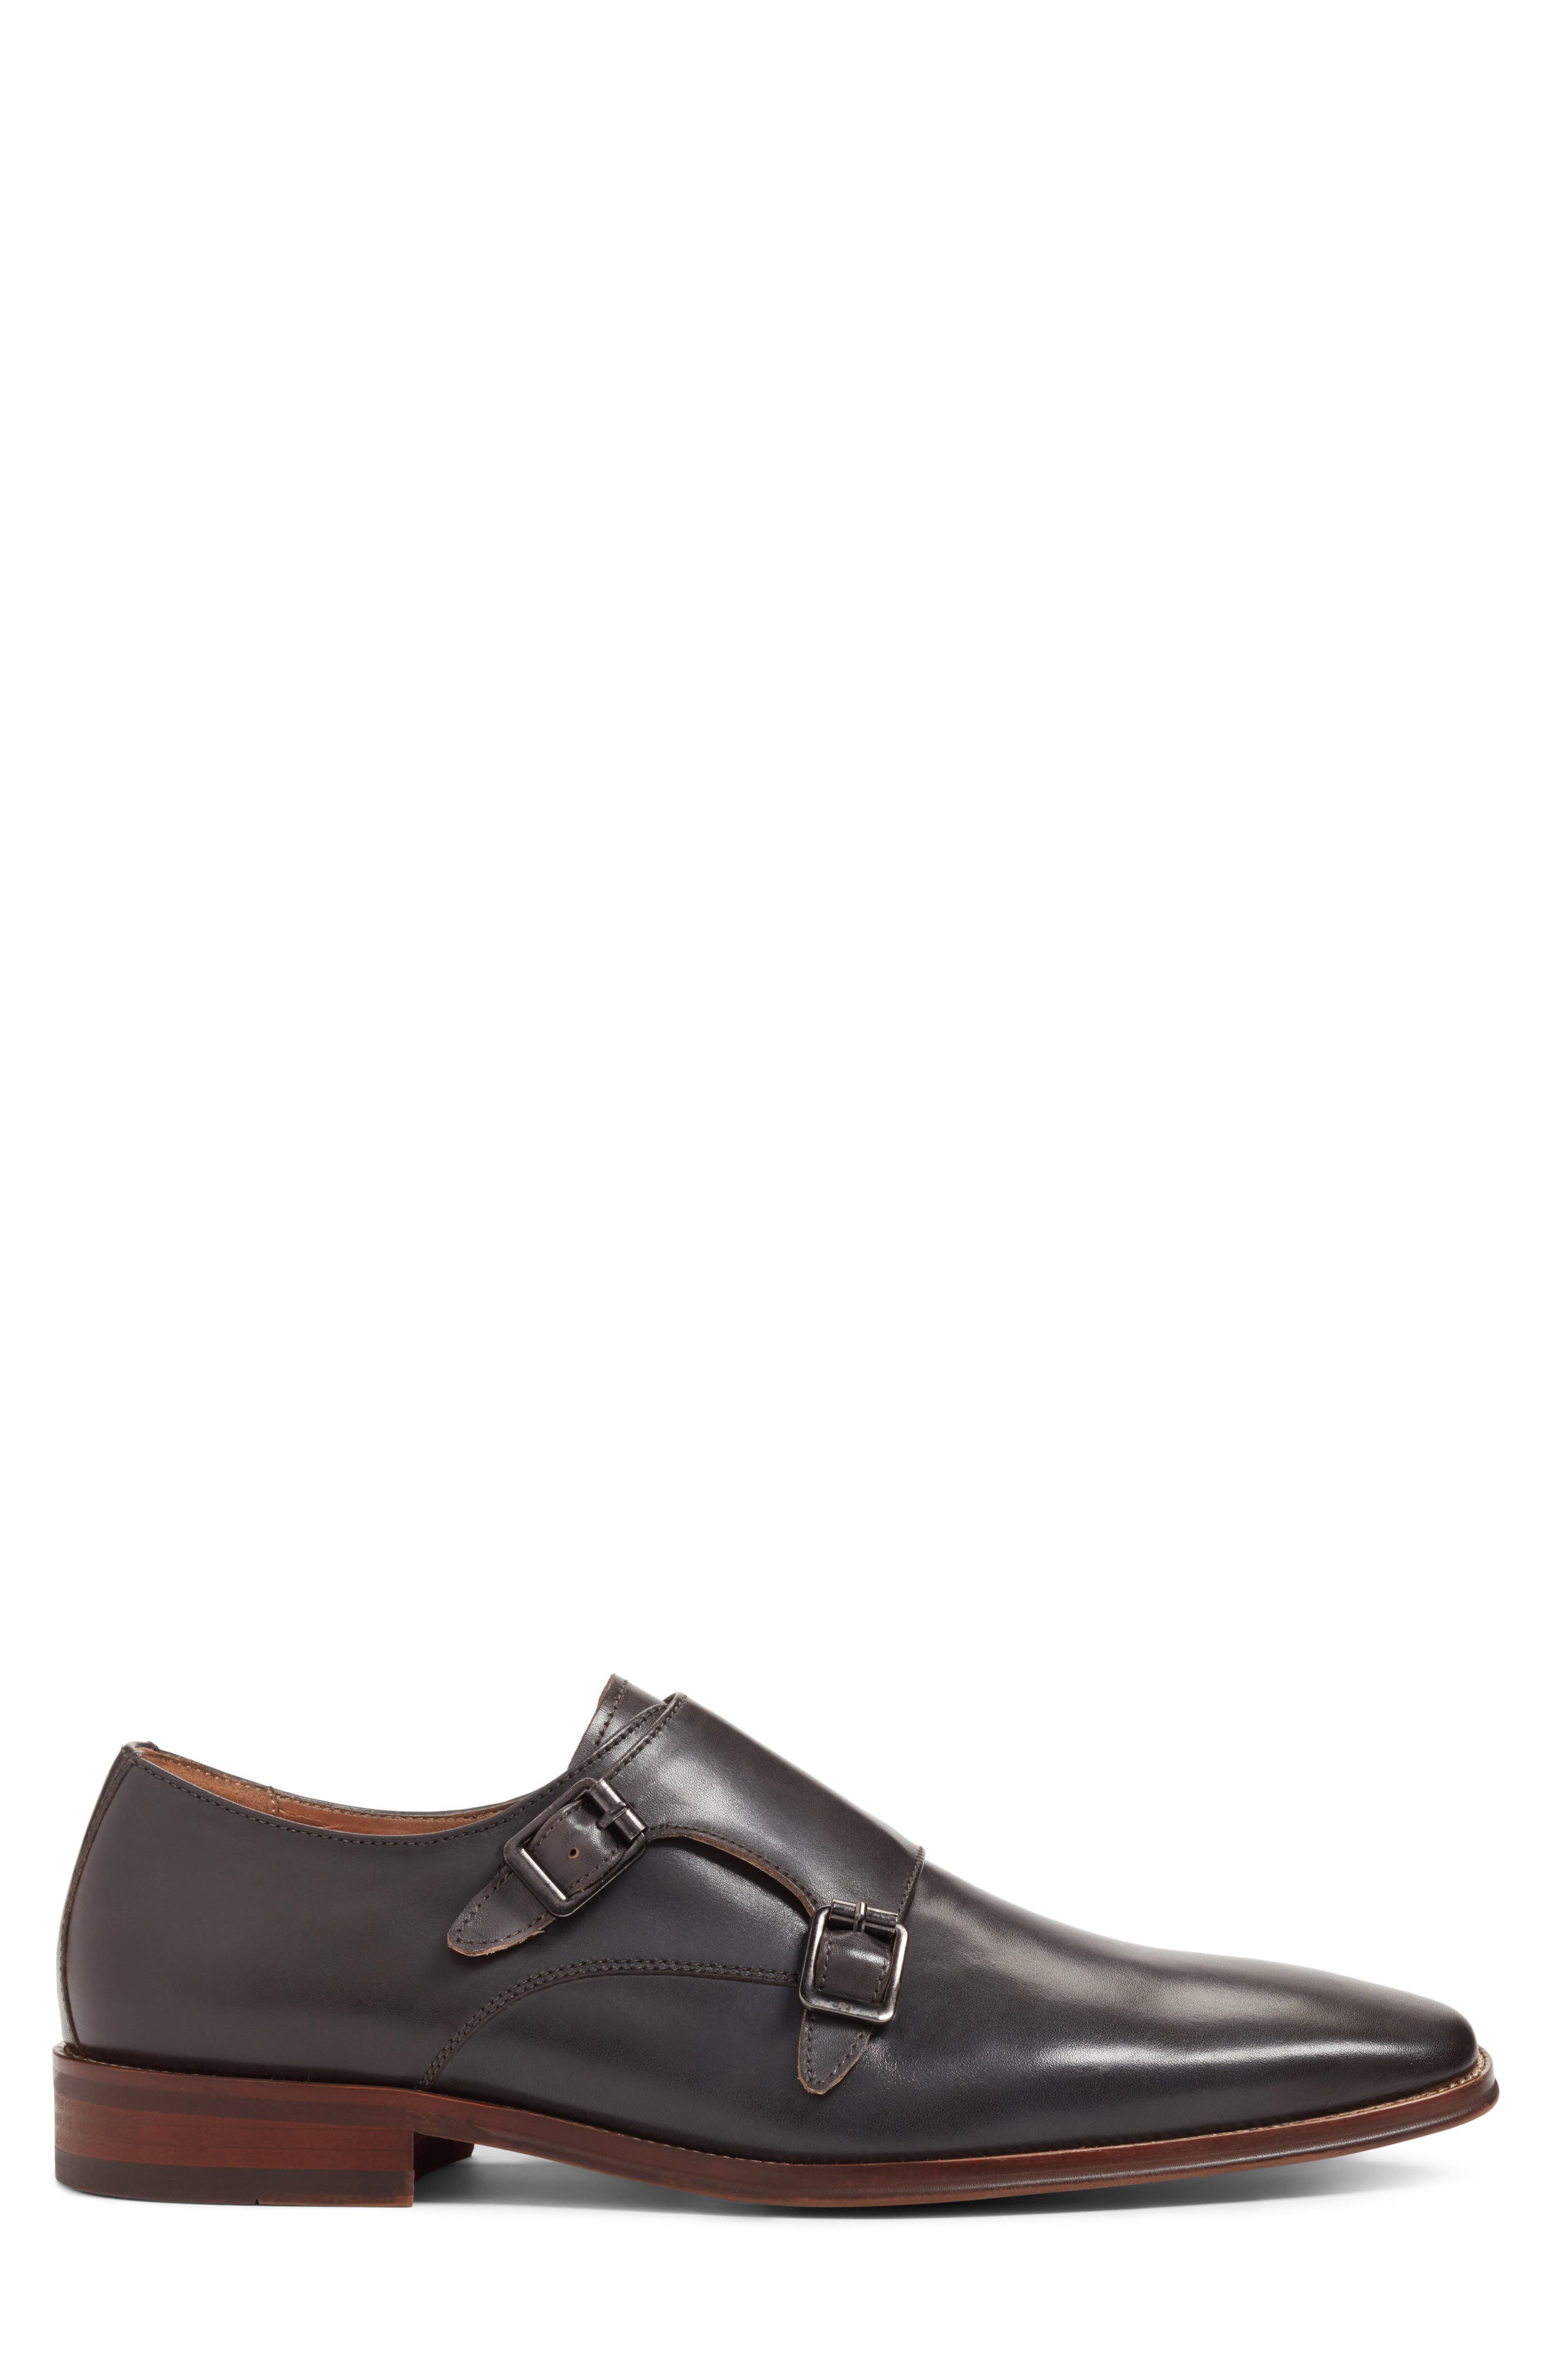 Sedona Double Strap Monk Shoe,                             Alternate thumbnail 3, color,                             Grey Leather